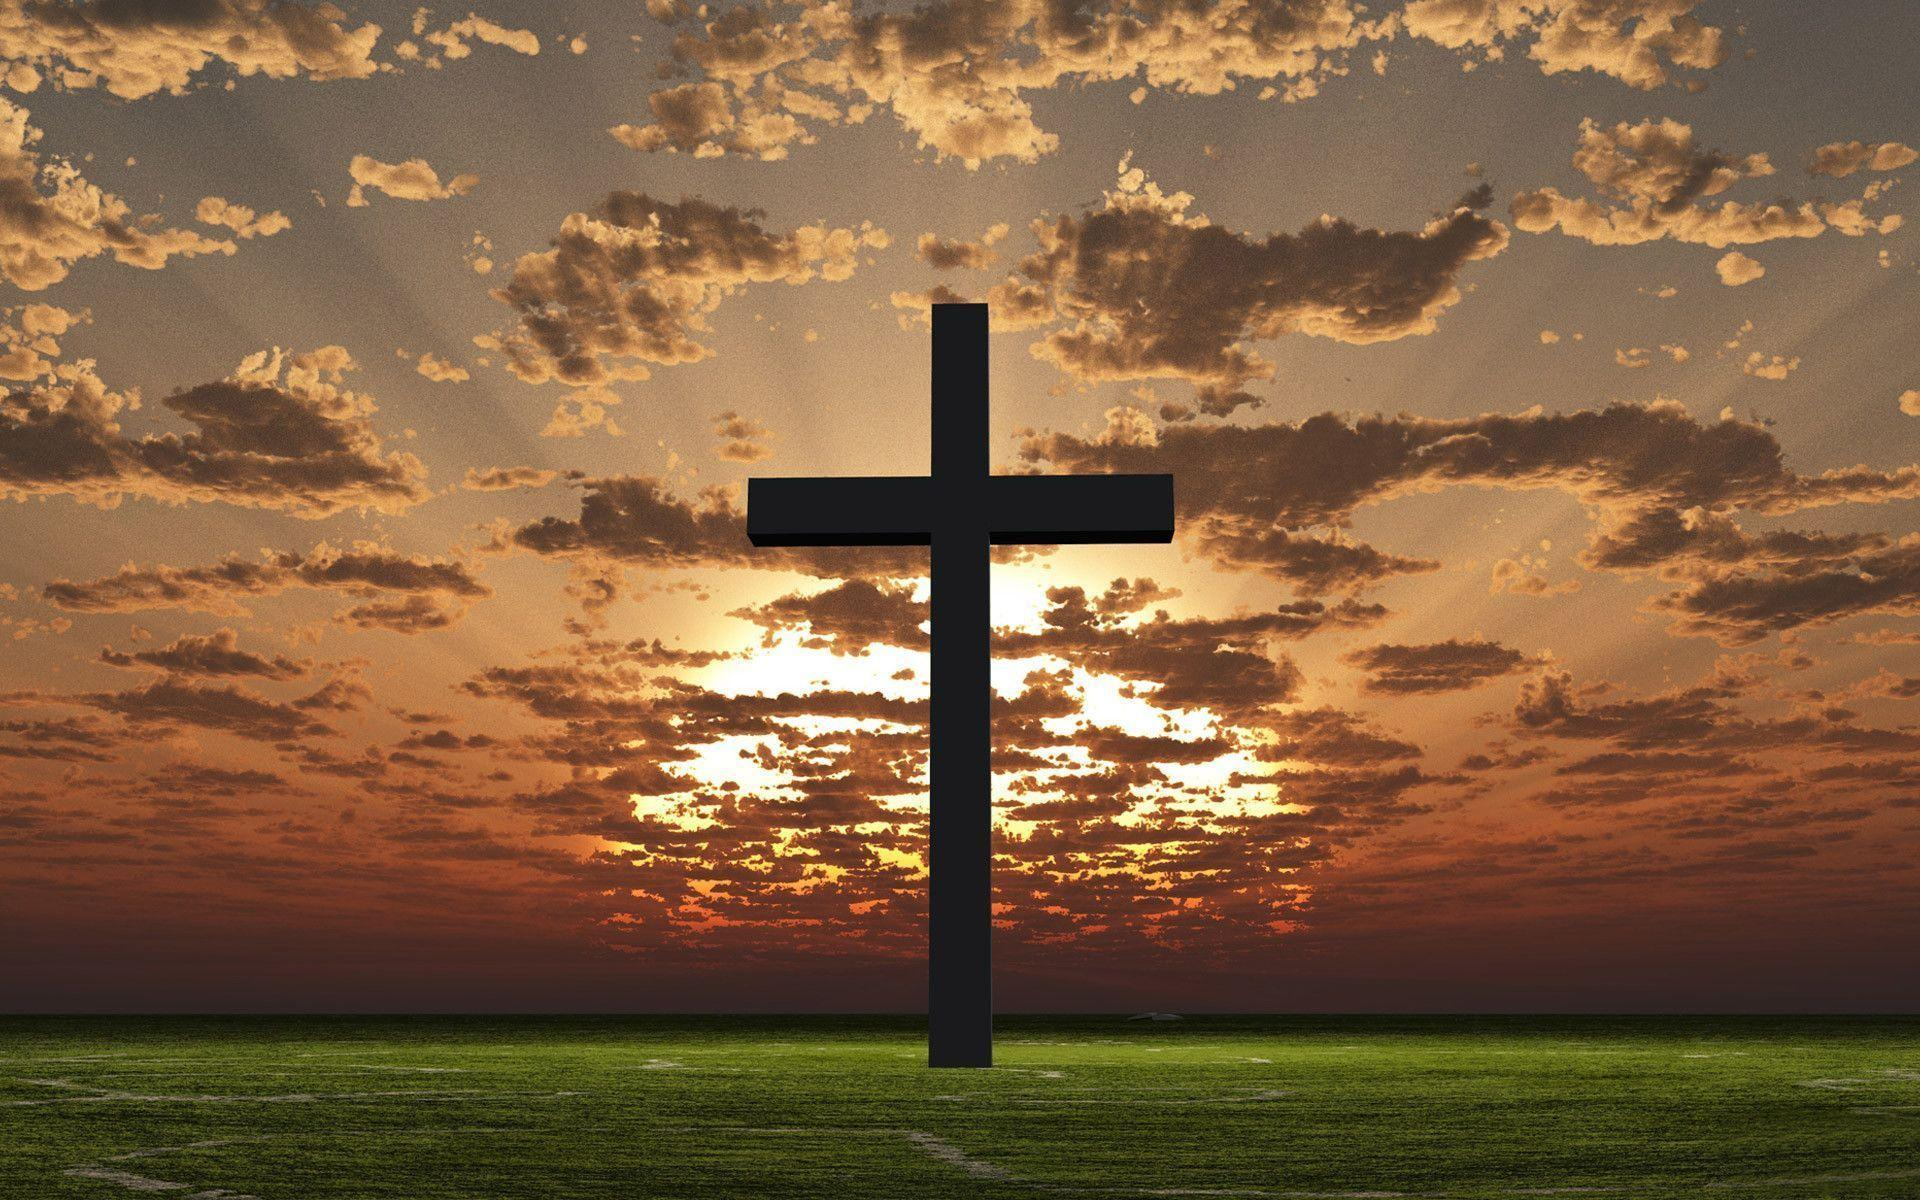 Christian Cross Wallpapers - Full HD wallpaper search